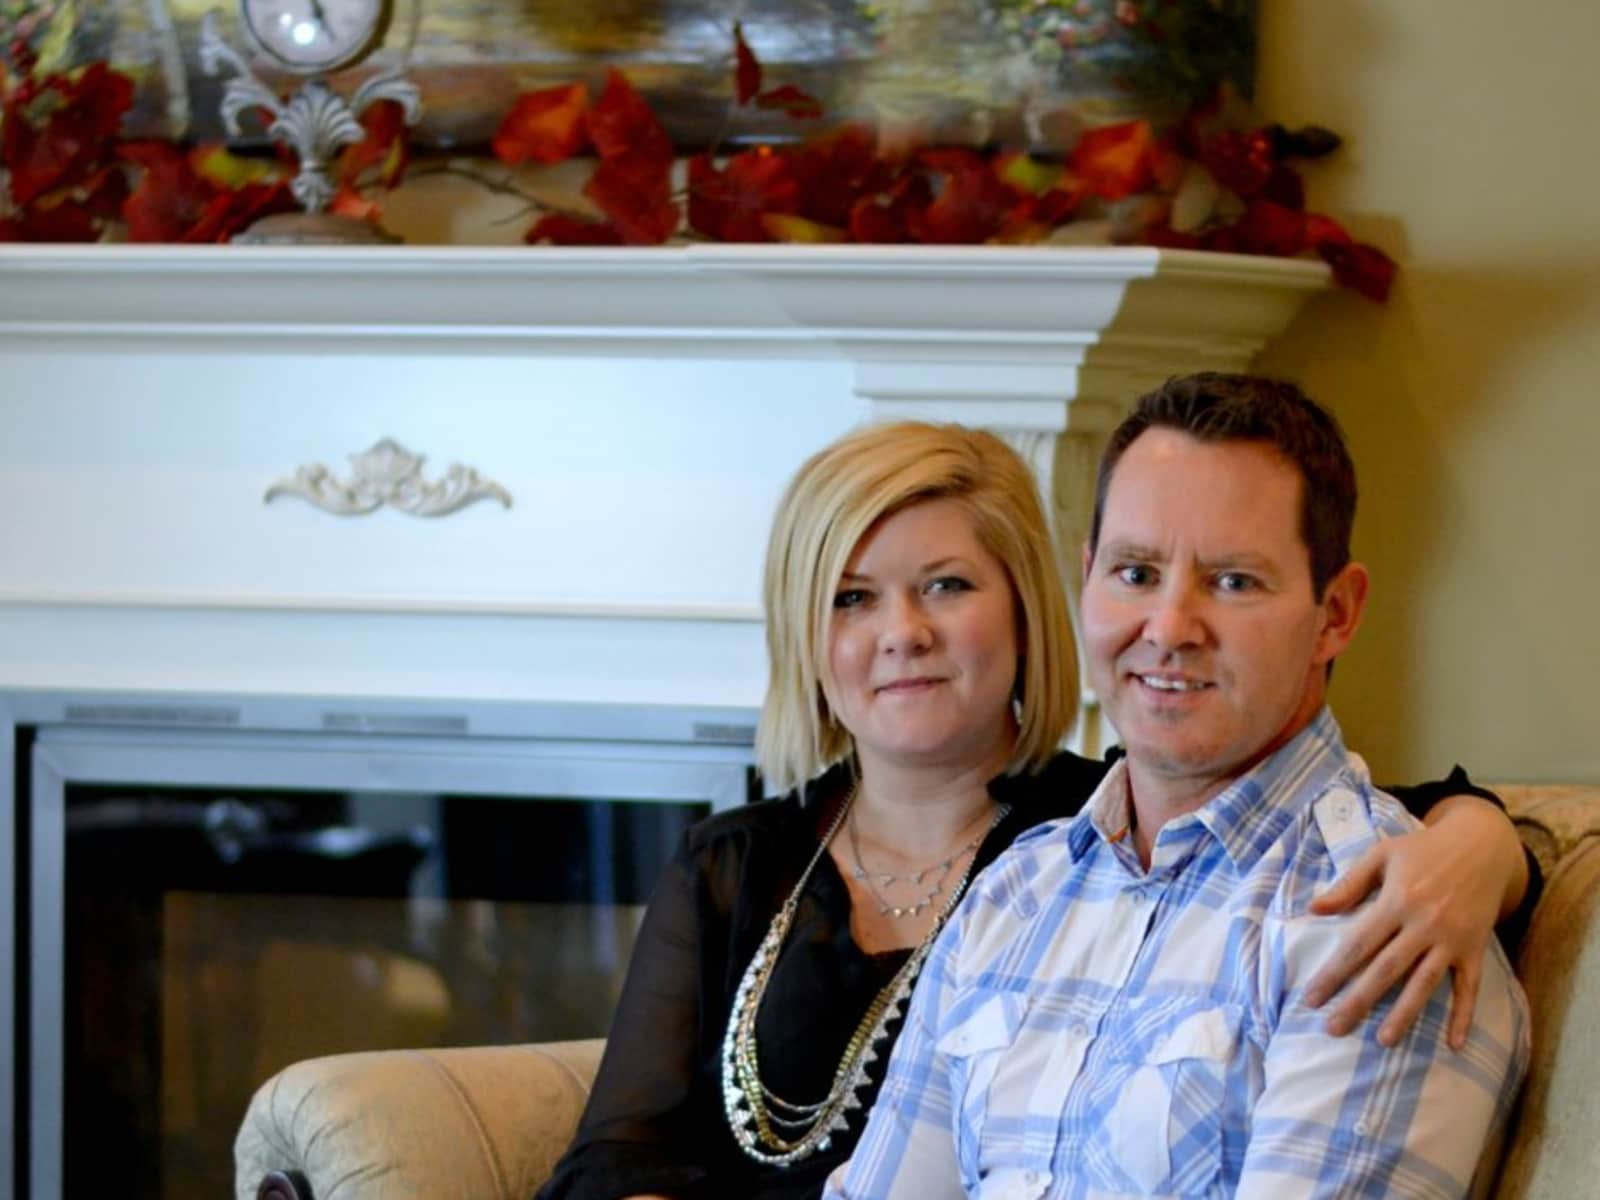 Kathy & Dean from Edmonton, Alberta, Canada